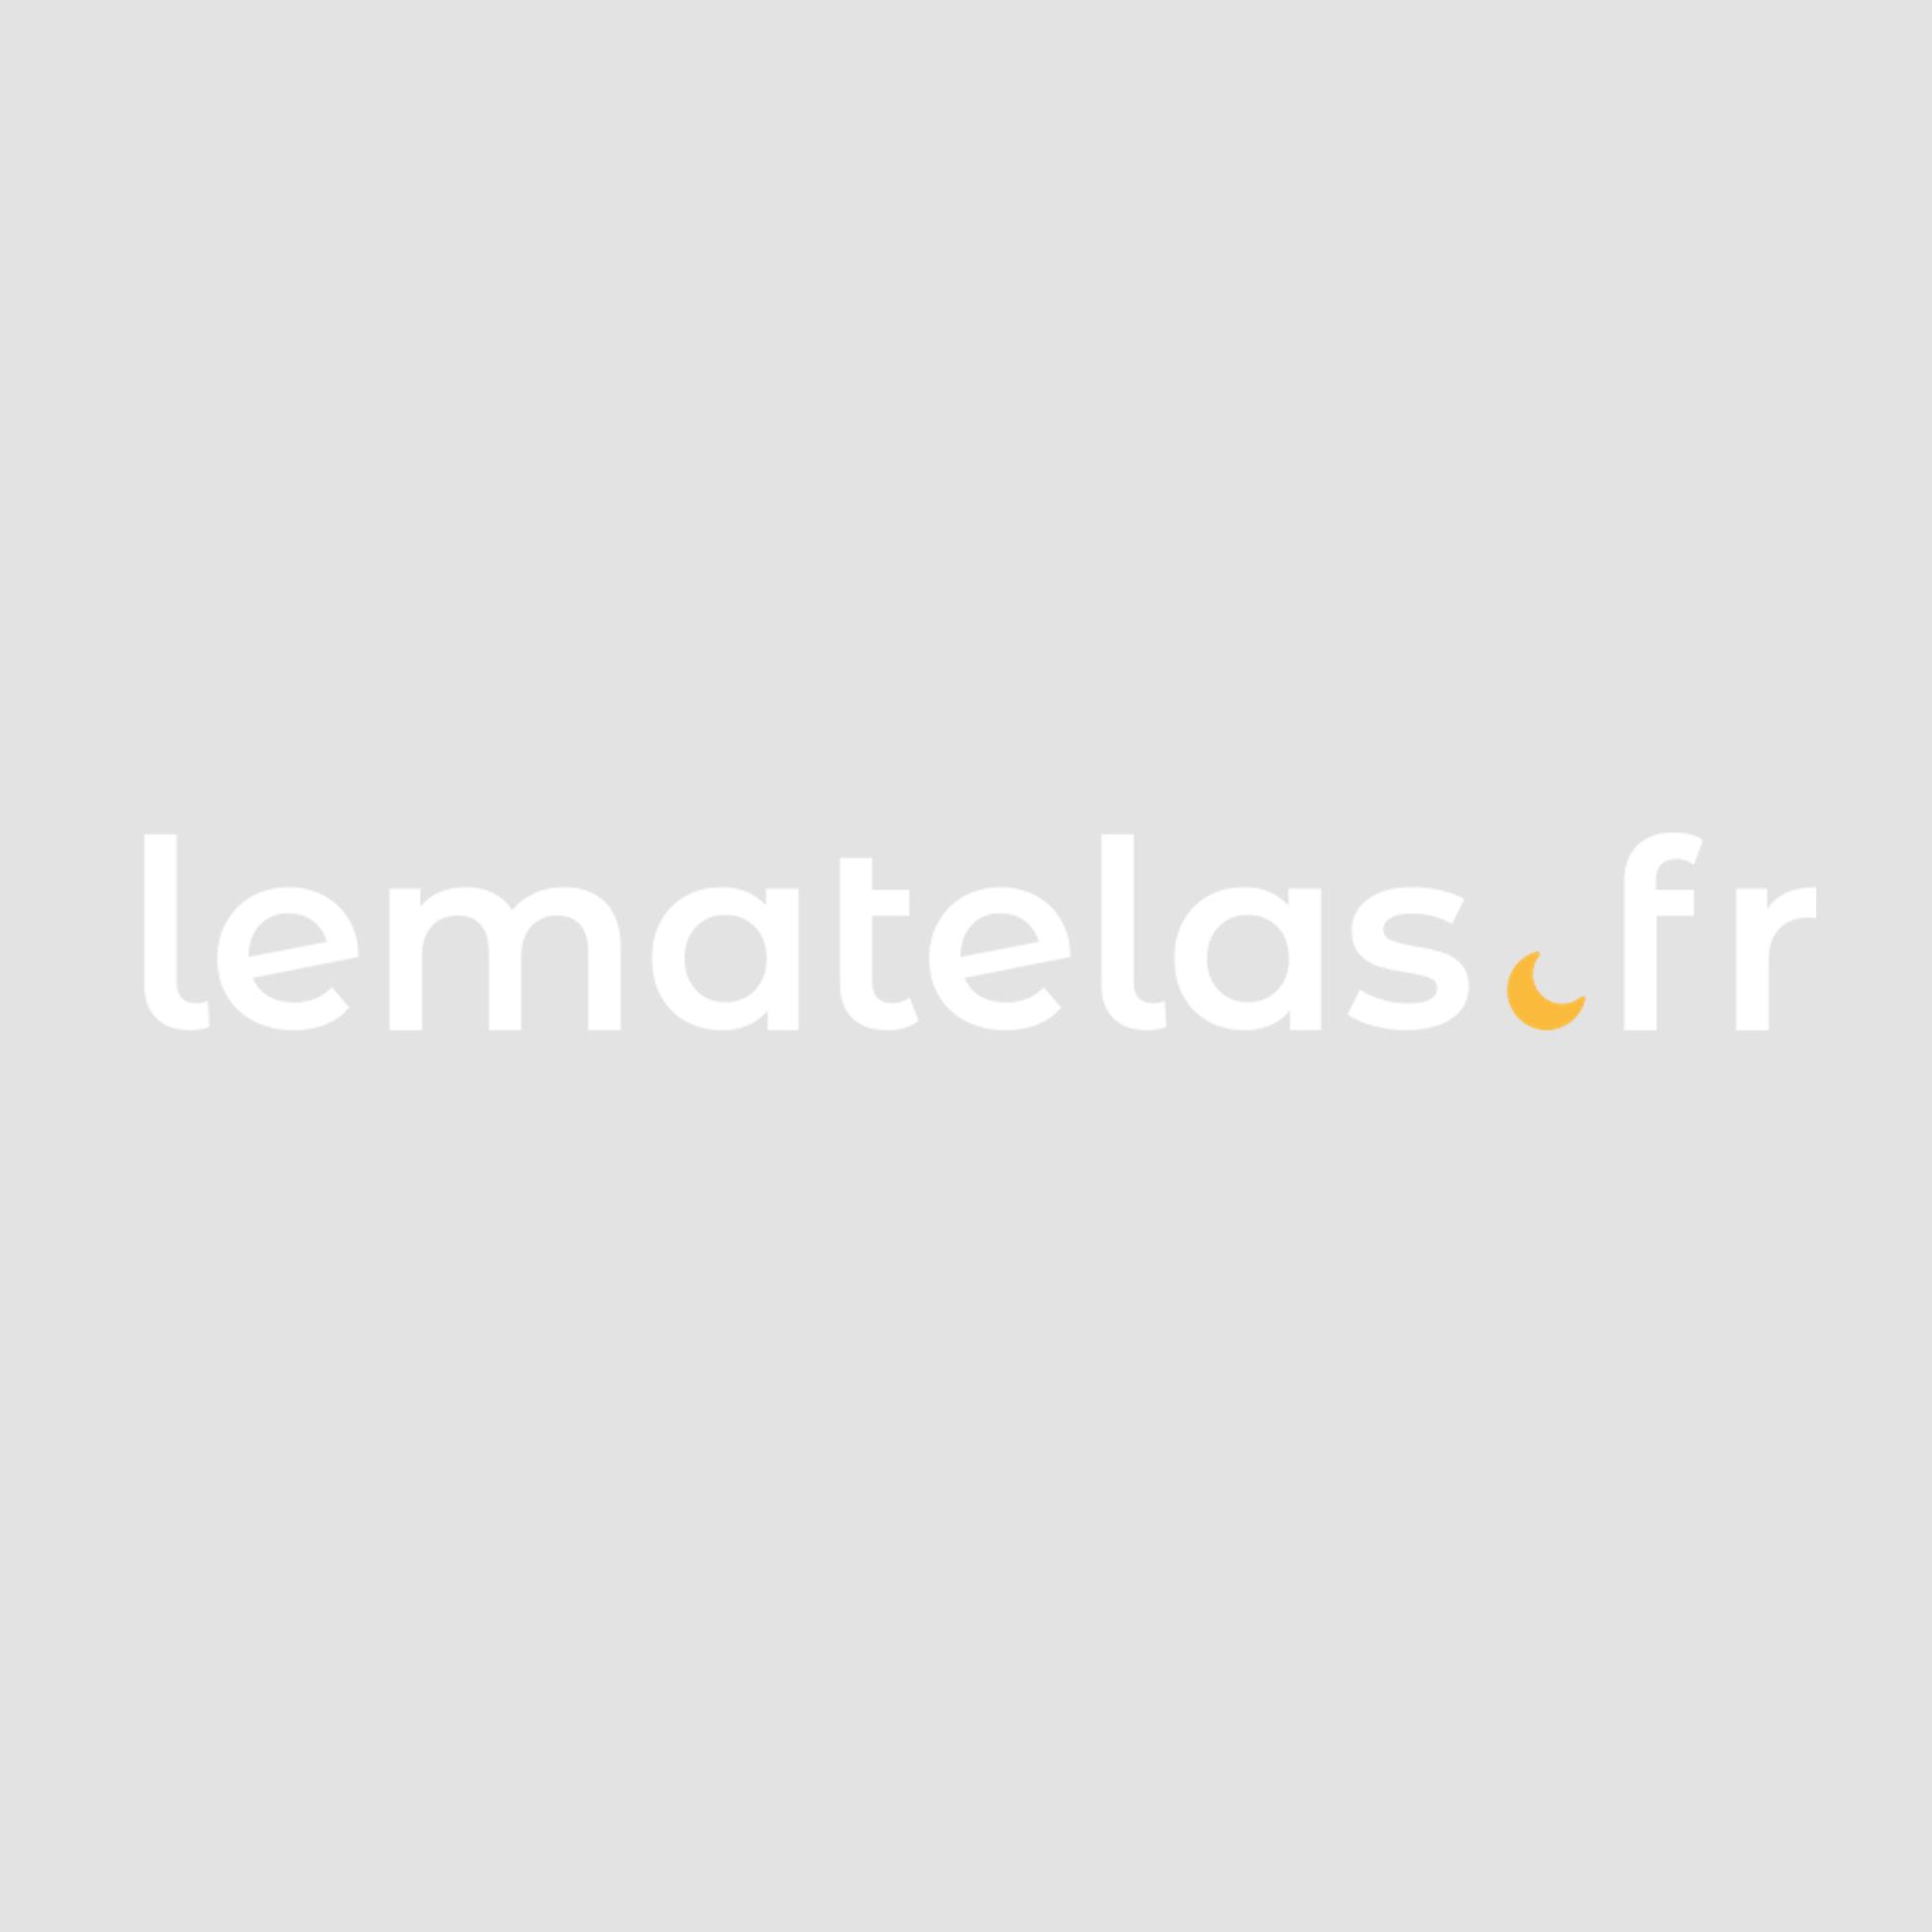 Ensemble Lit futon style japonais + matelas futon écru 160x200